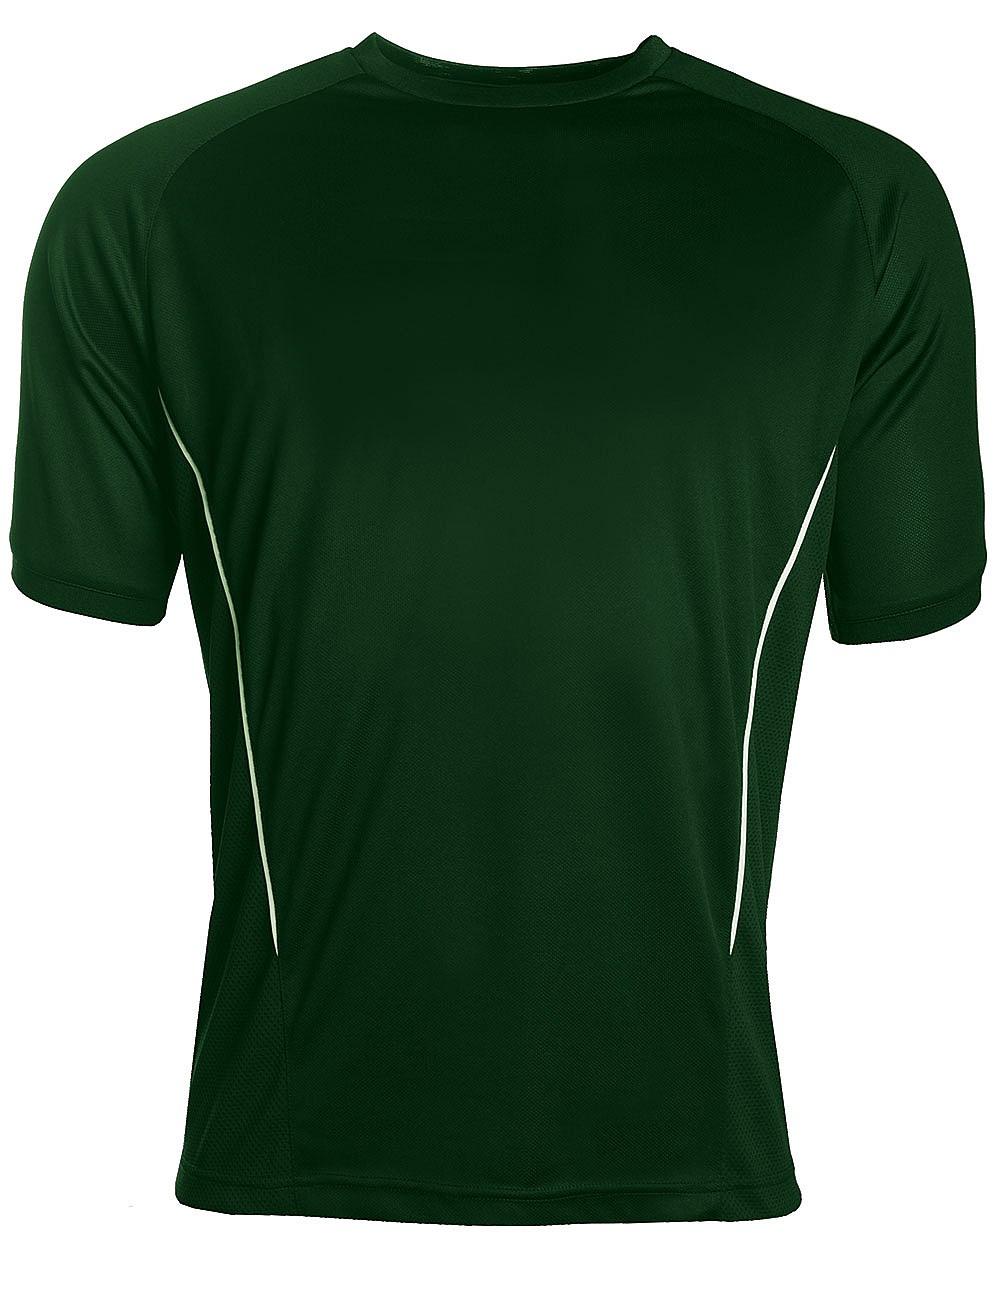 Aptus green and white training top